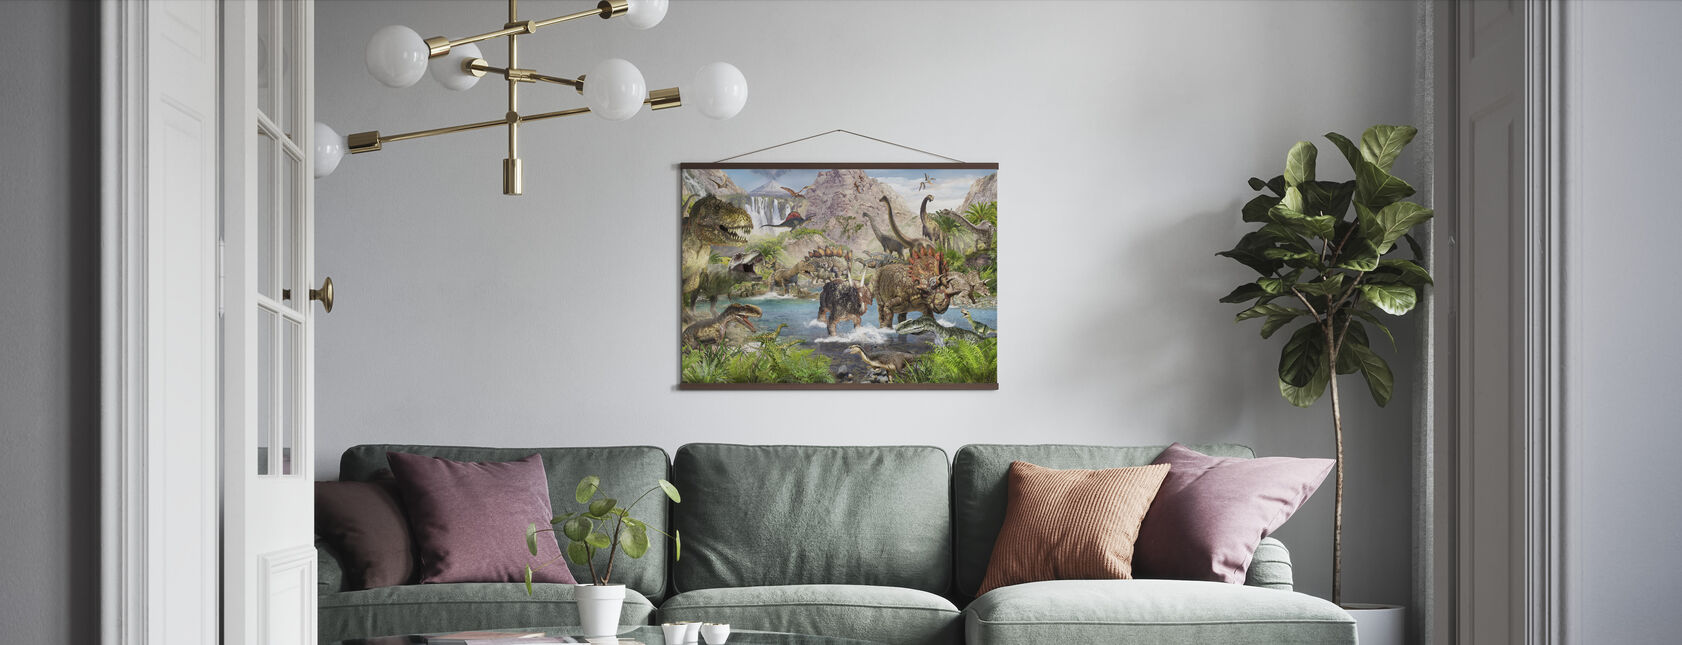 Dinosaur verden - Plakat - Stue